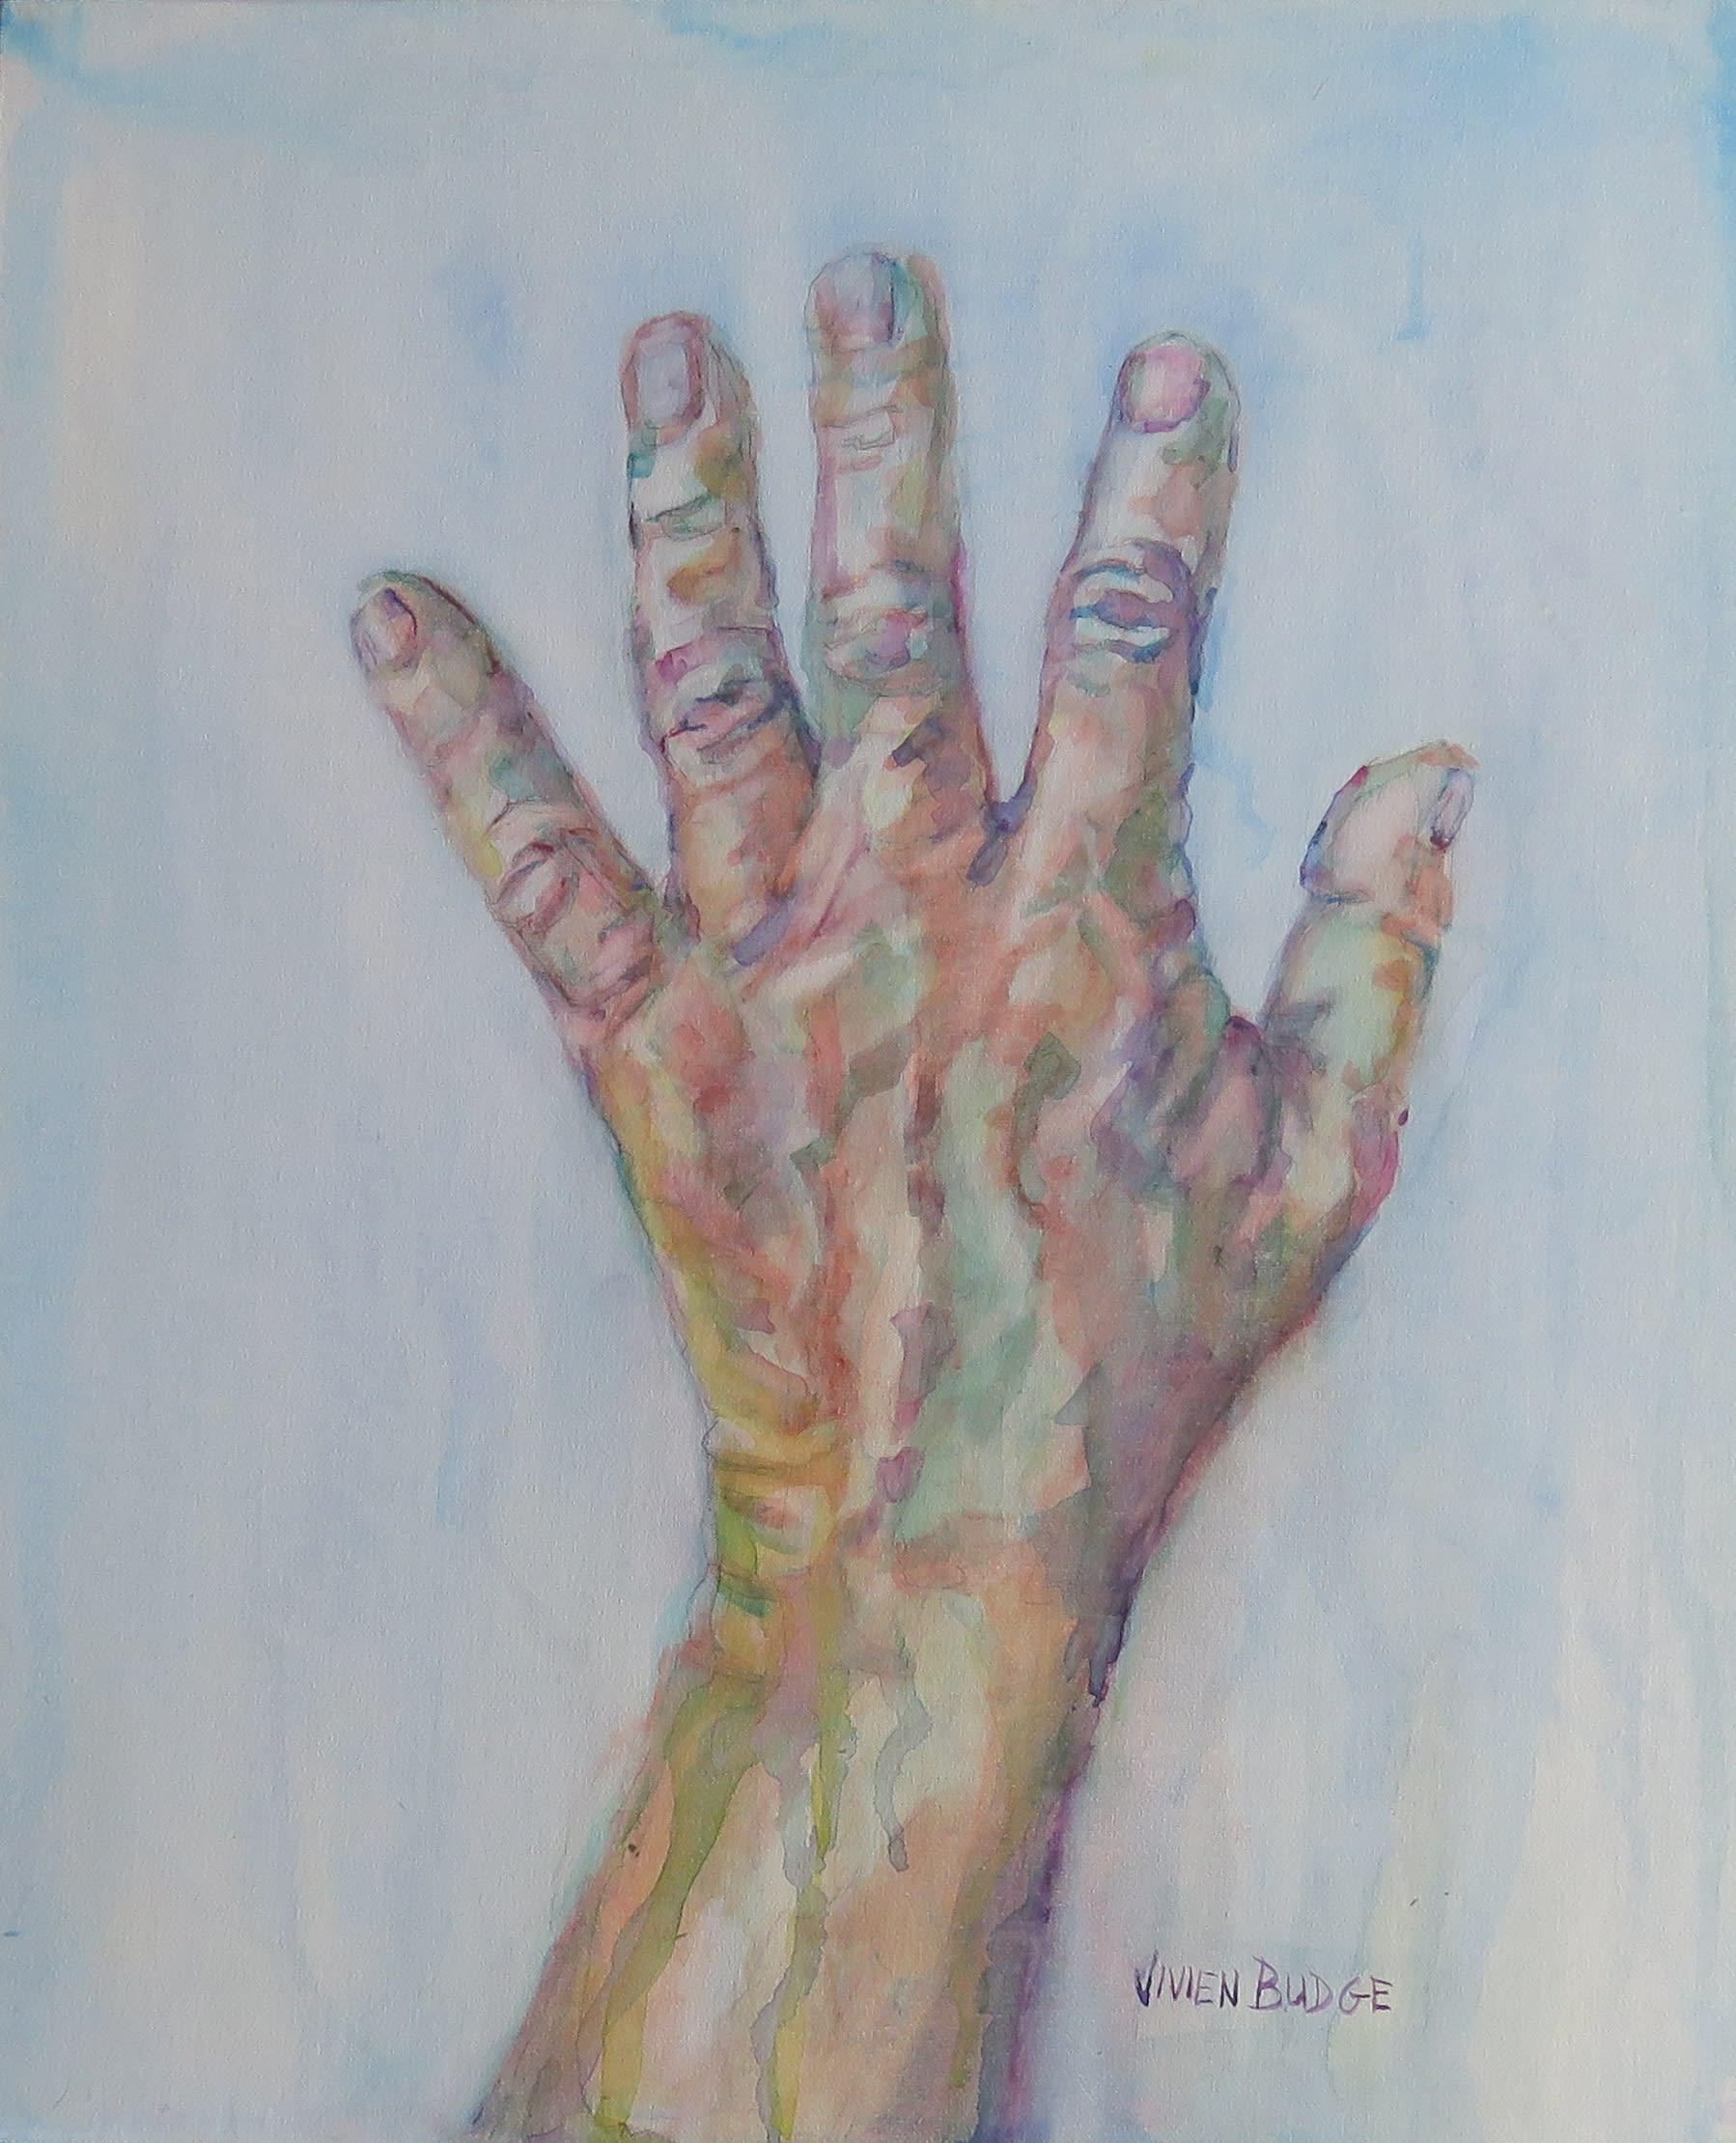 <span class=&#34;link fancybox-details-link&#34;><a href=&#34;/content/viewing-room/58/artworks2415/&#34;>View Detail Page</a></span><div class=&#34;medium&#34;>Watercolour On Canvas</div> <div class=&#34;dimensions&#34;>30.5cm x 25.5cm</div>